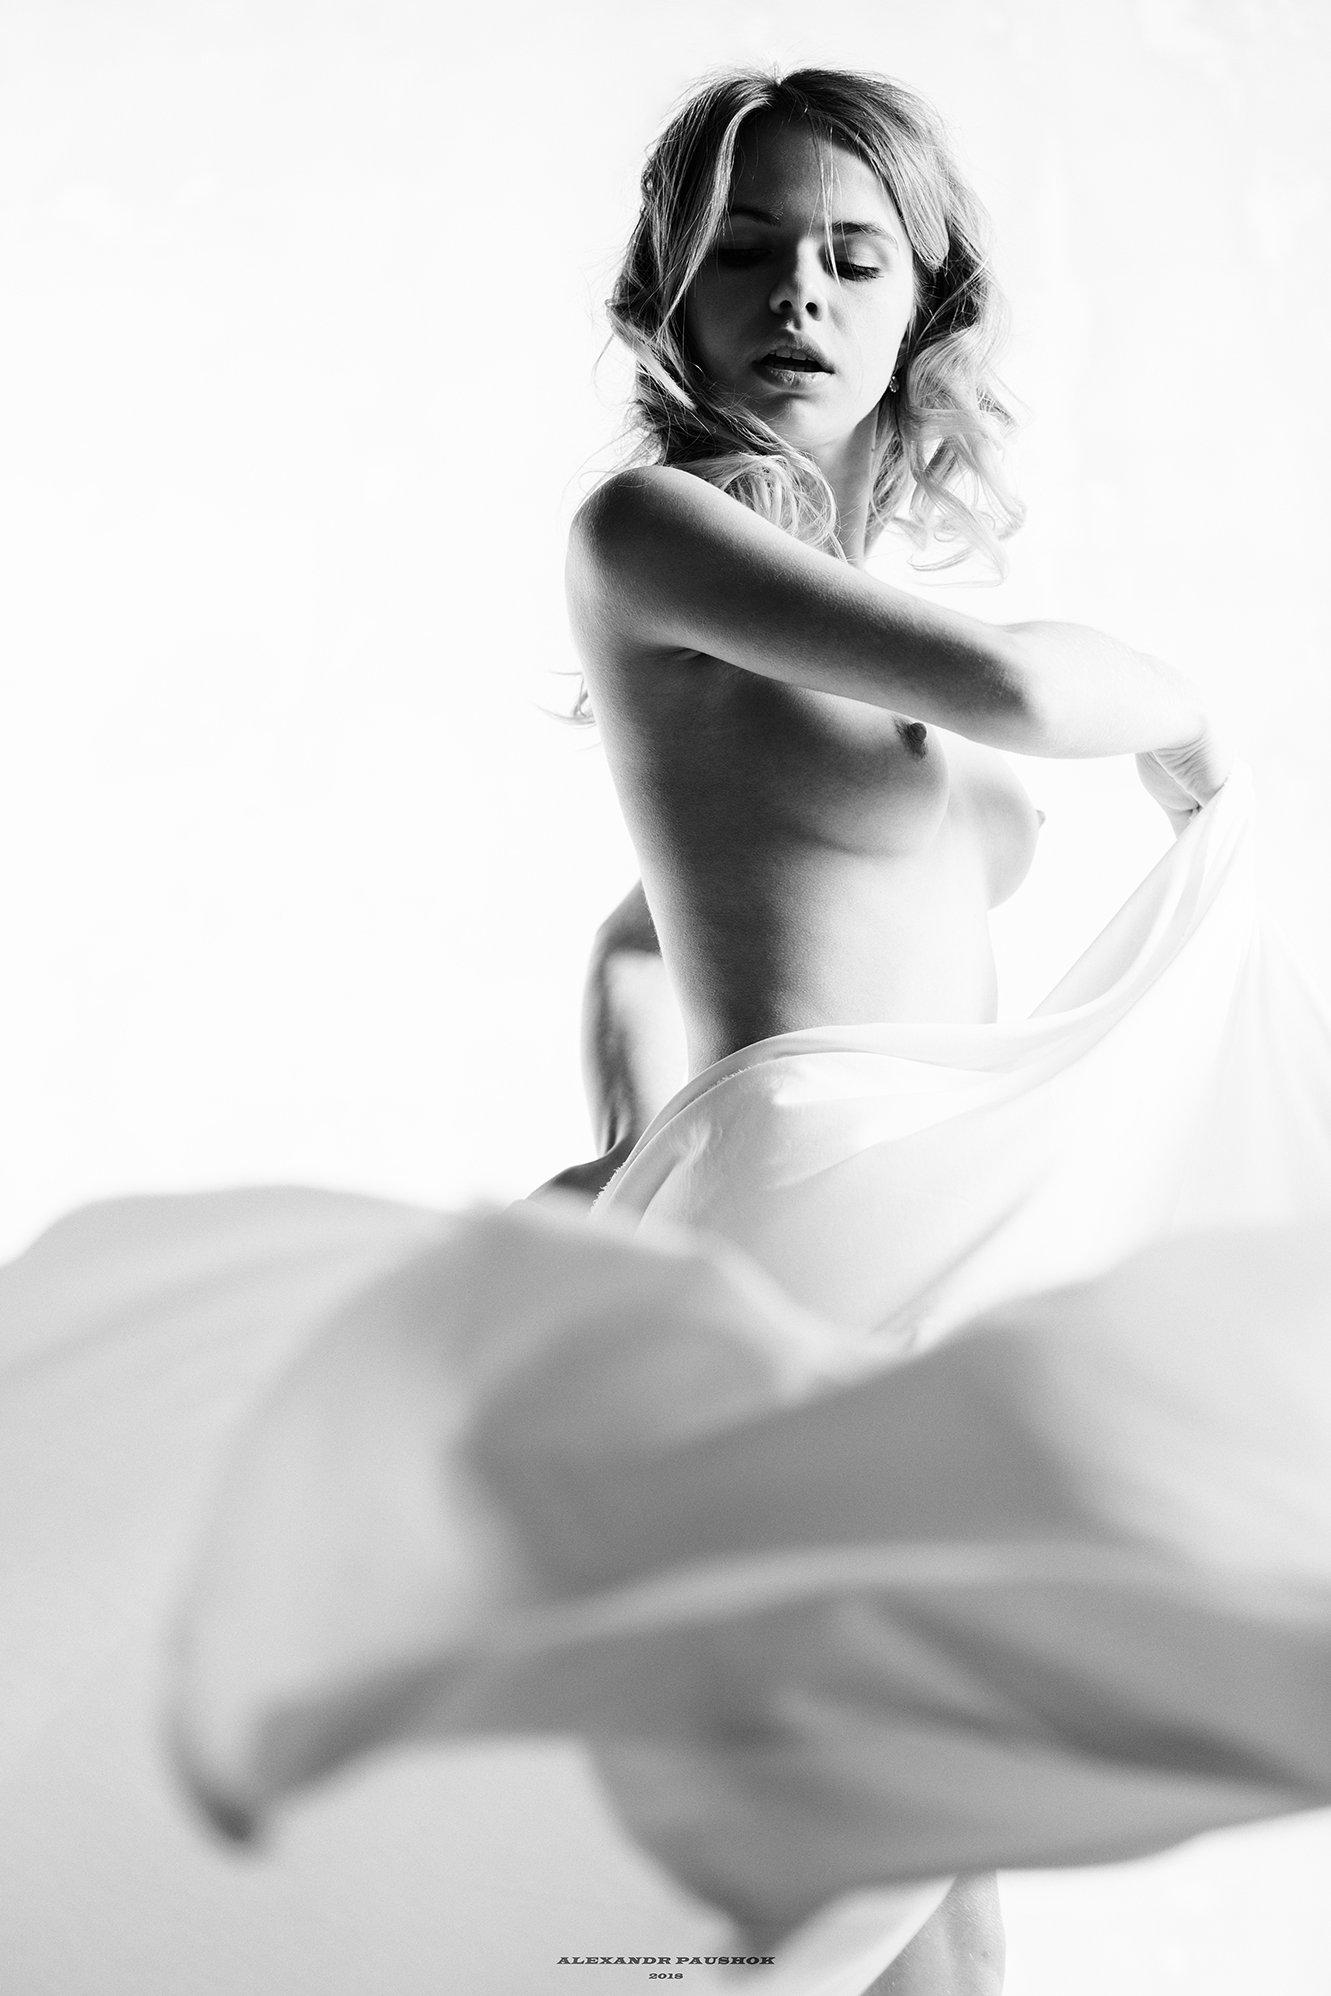 nude, body, beauty, girl, young, monochrome, blackandwhite, Paushok Alexander